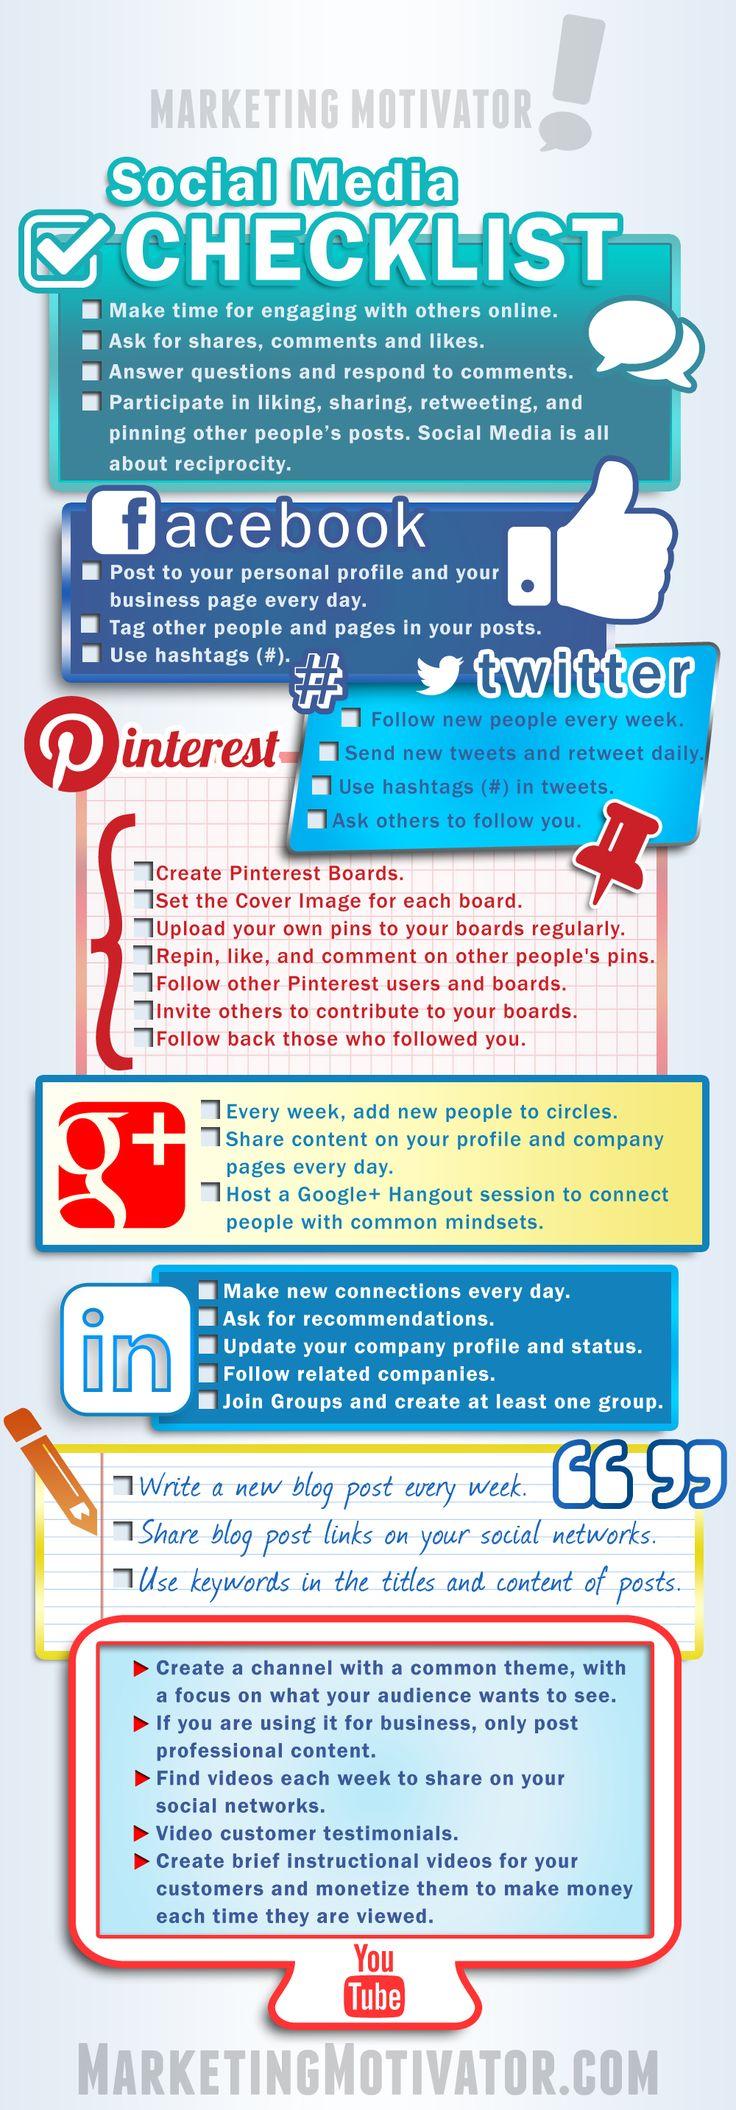 Social Media Checklist http://www.marketingmotivator.info/home/newest-products/21-social-media-checklist